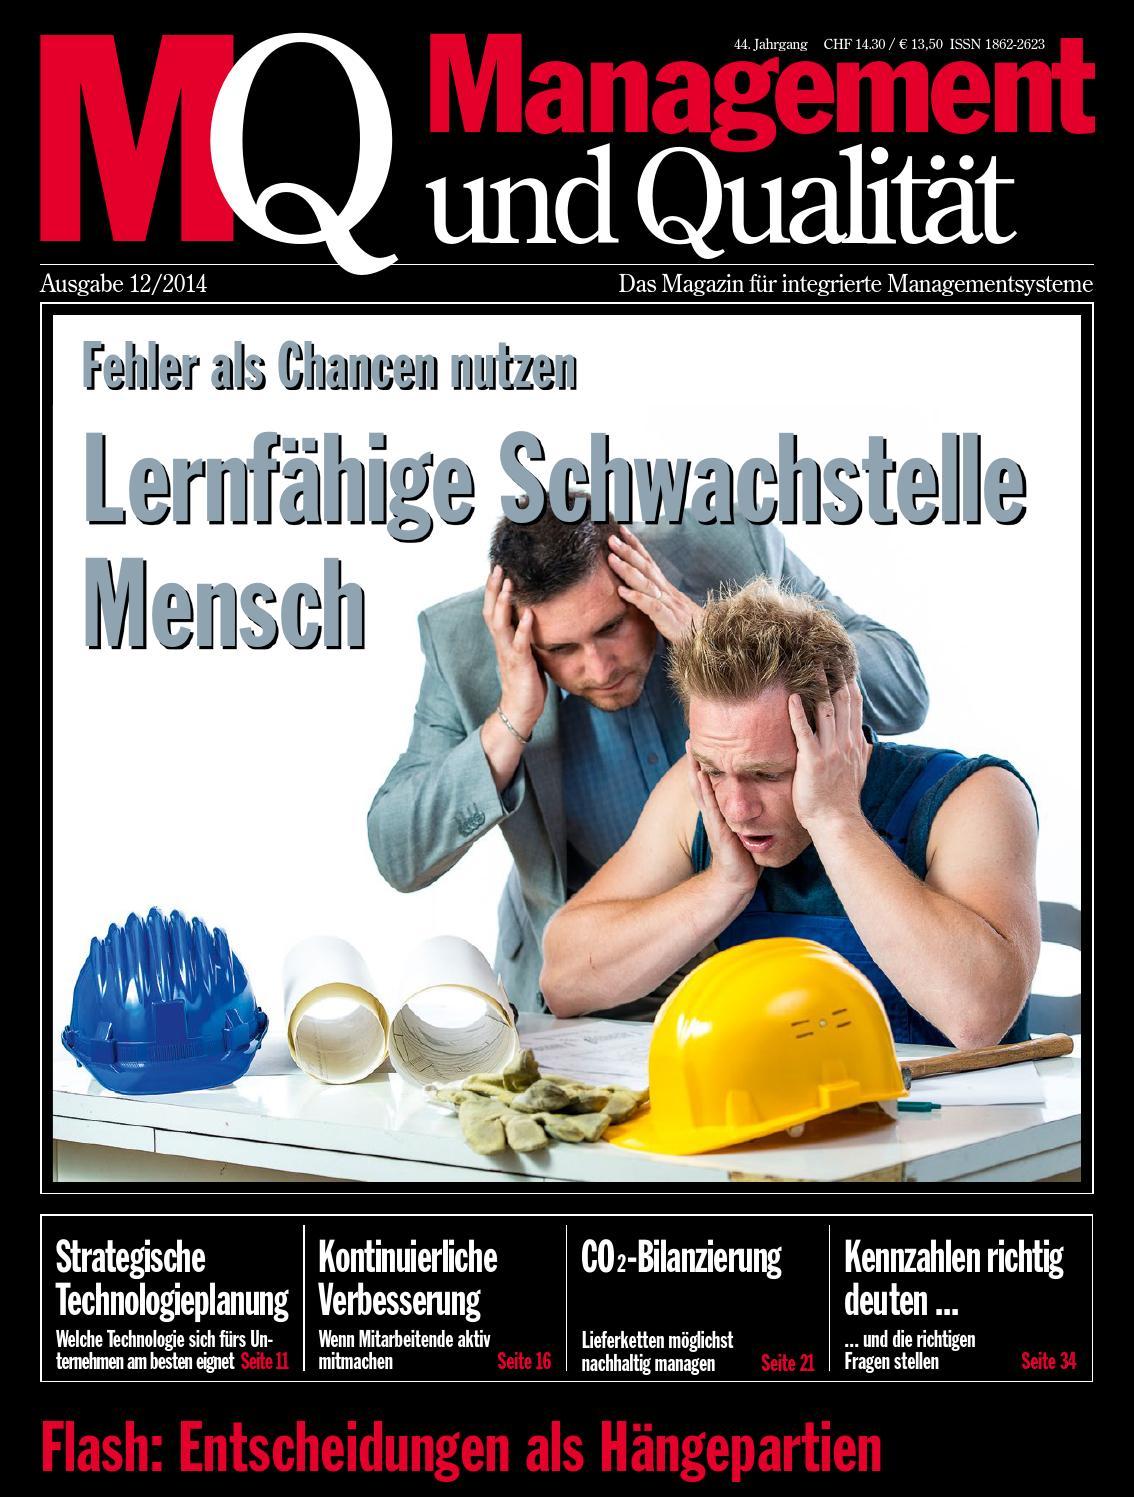 MQ Management und Qualität by SAQ Swiss Association for Quality ...